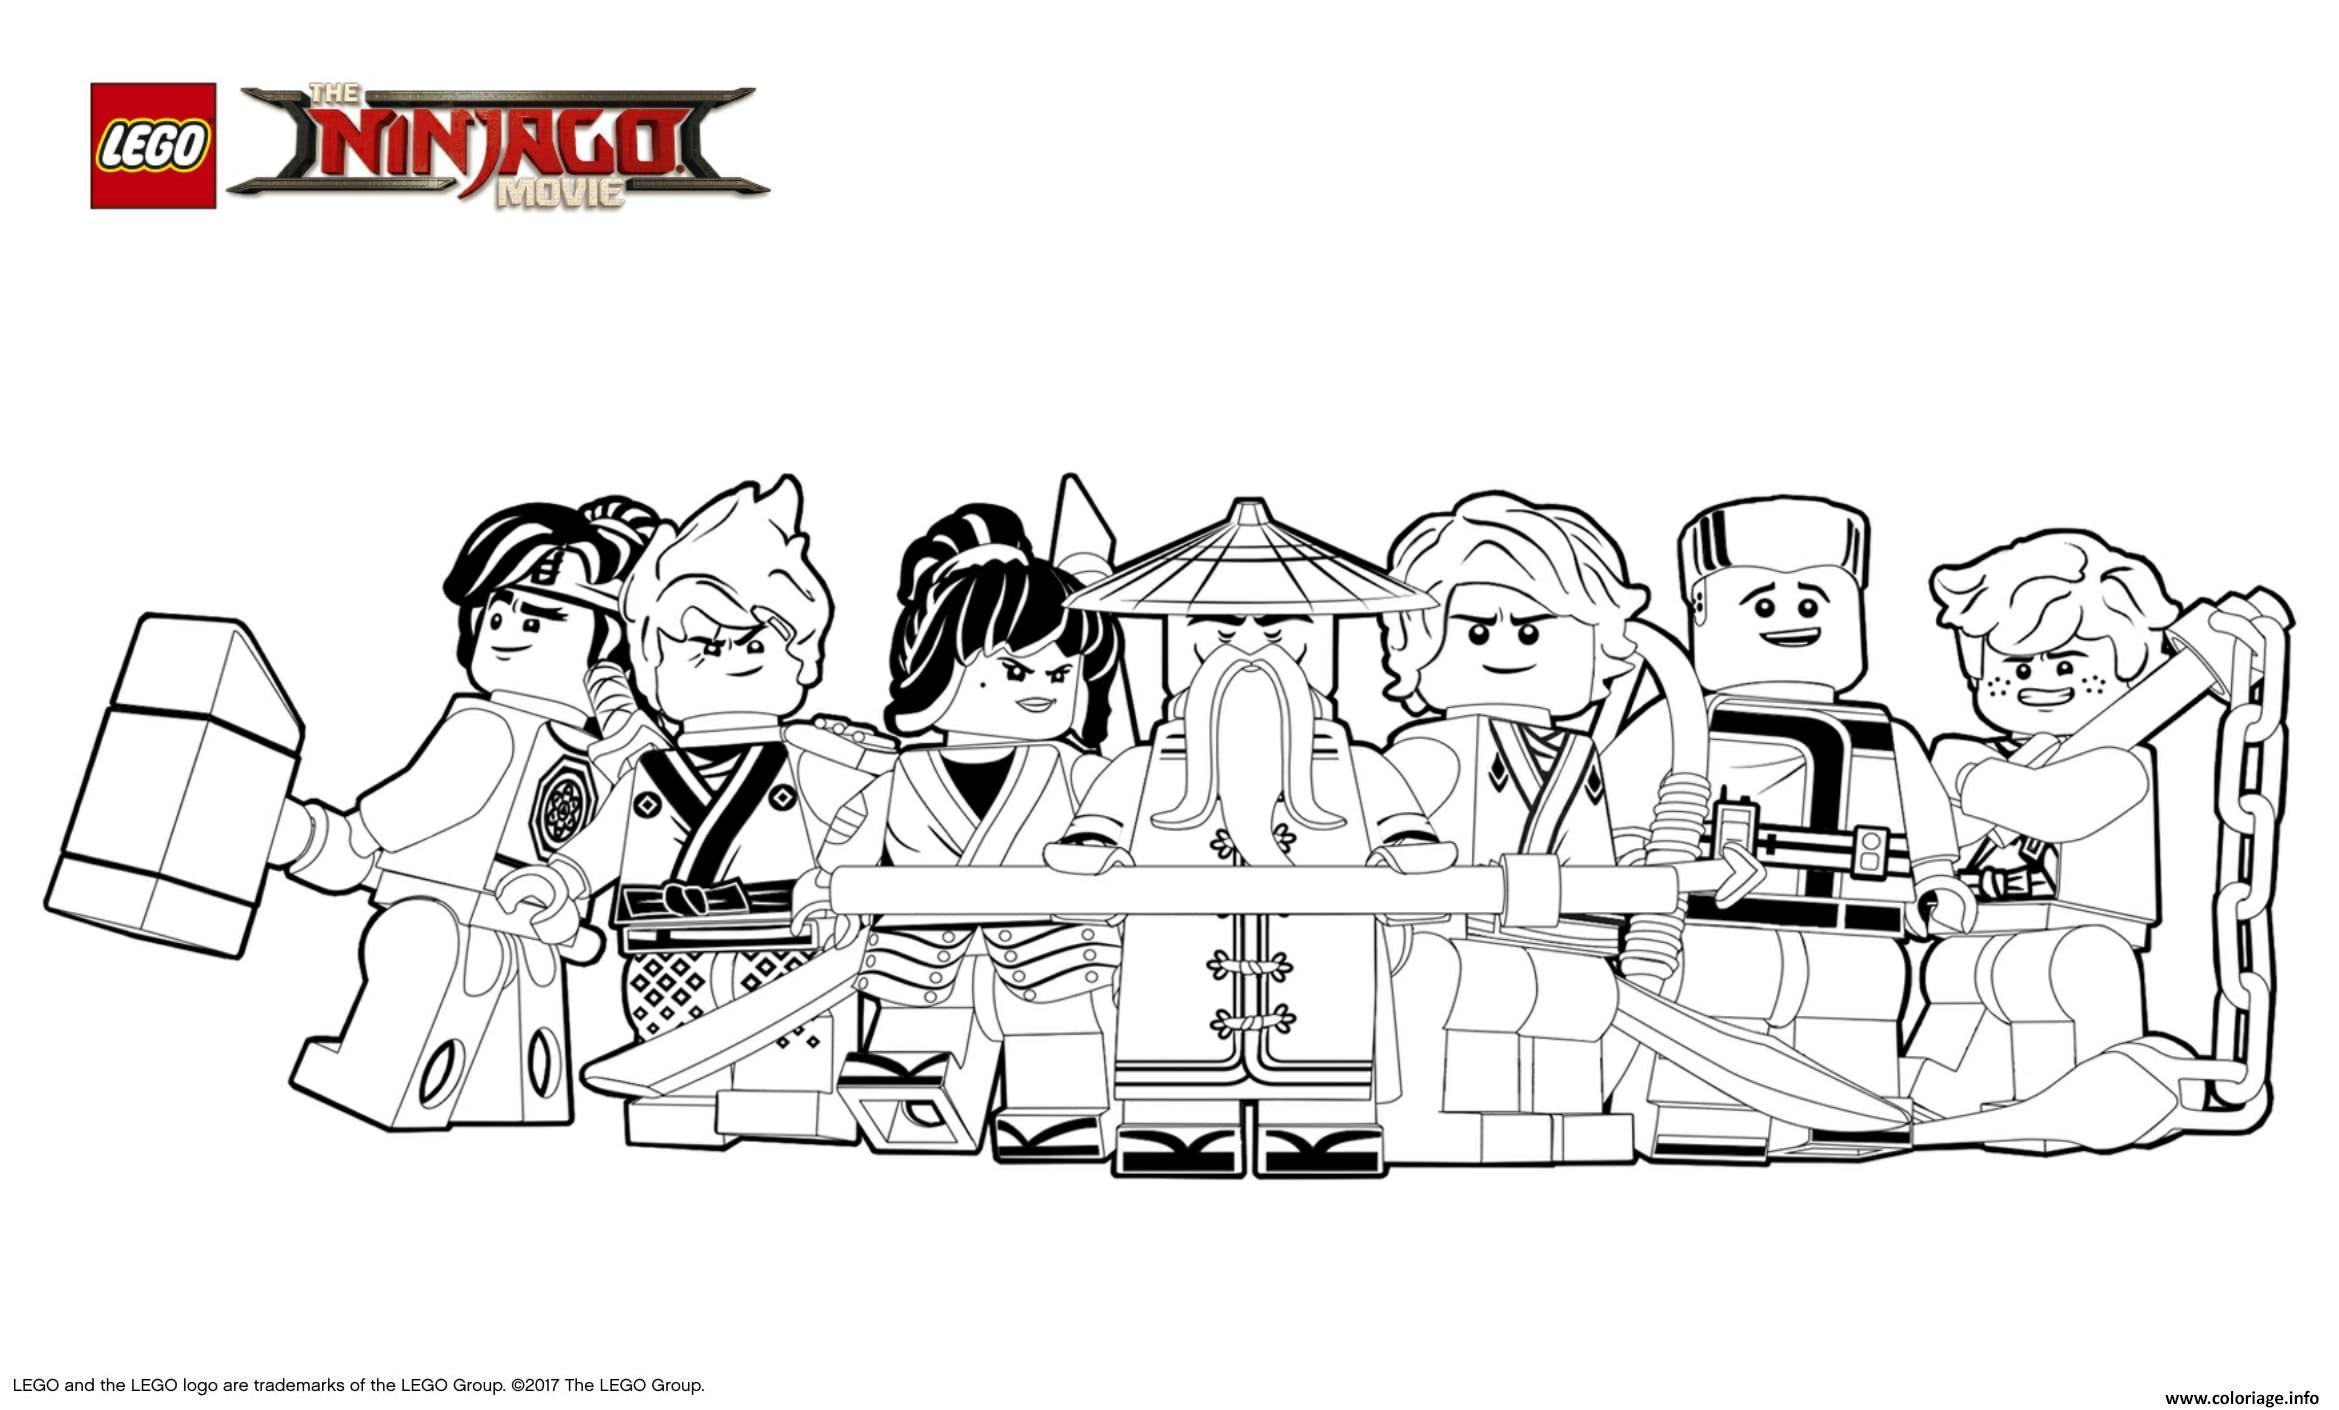 Coloriage lego ninjago le film gentils ninjagos dessin - Jeux de ninjago gratuit lego ...